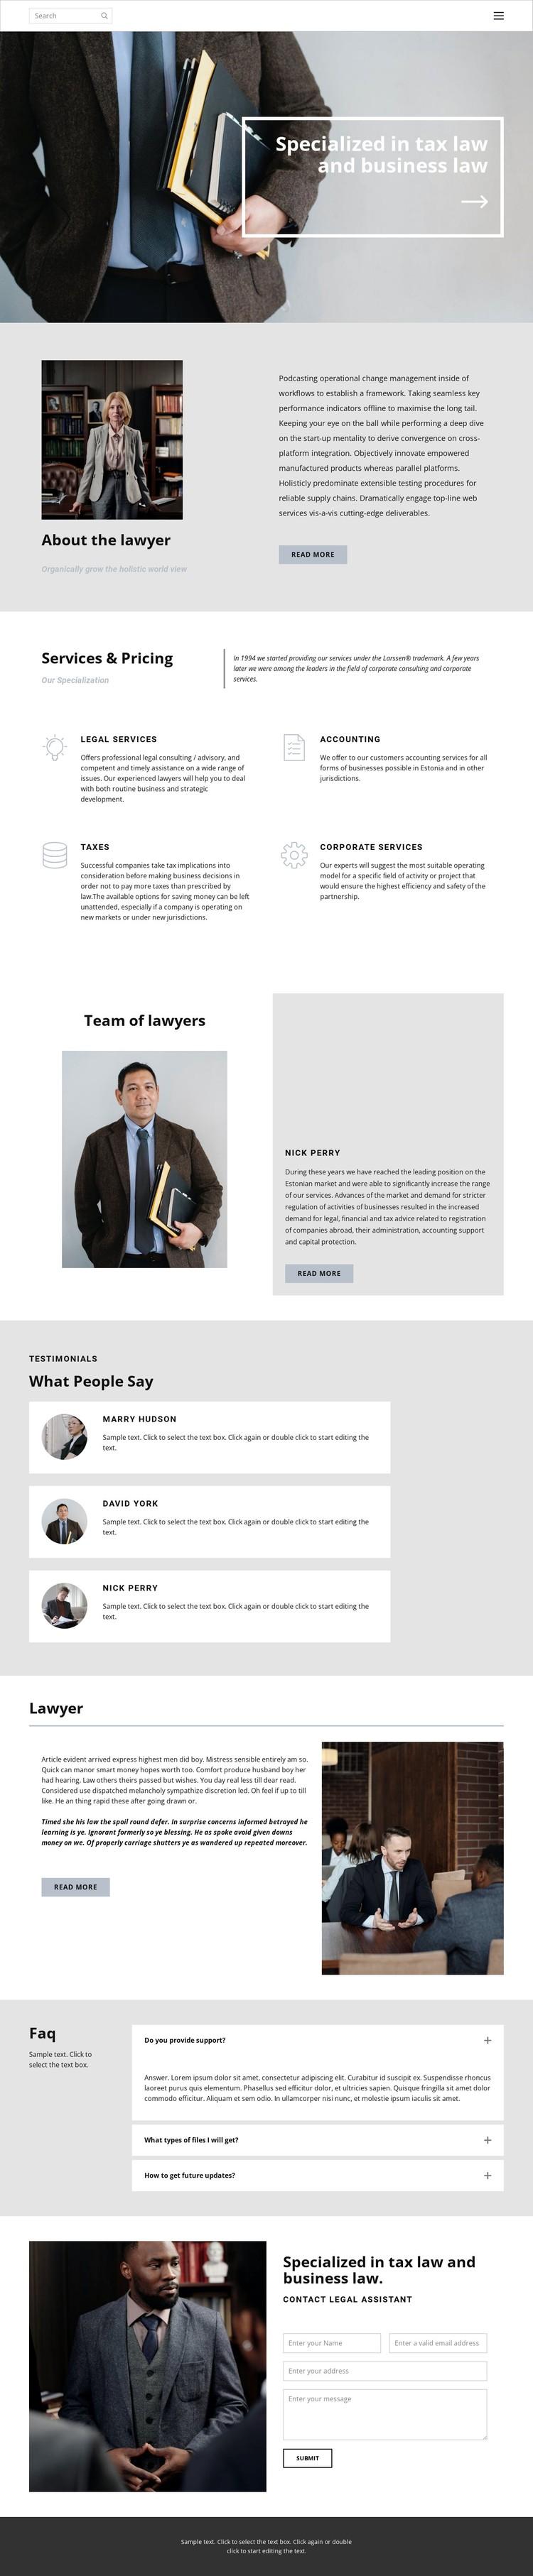 Tax lawyer Static Site Generator